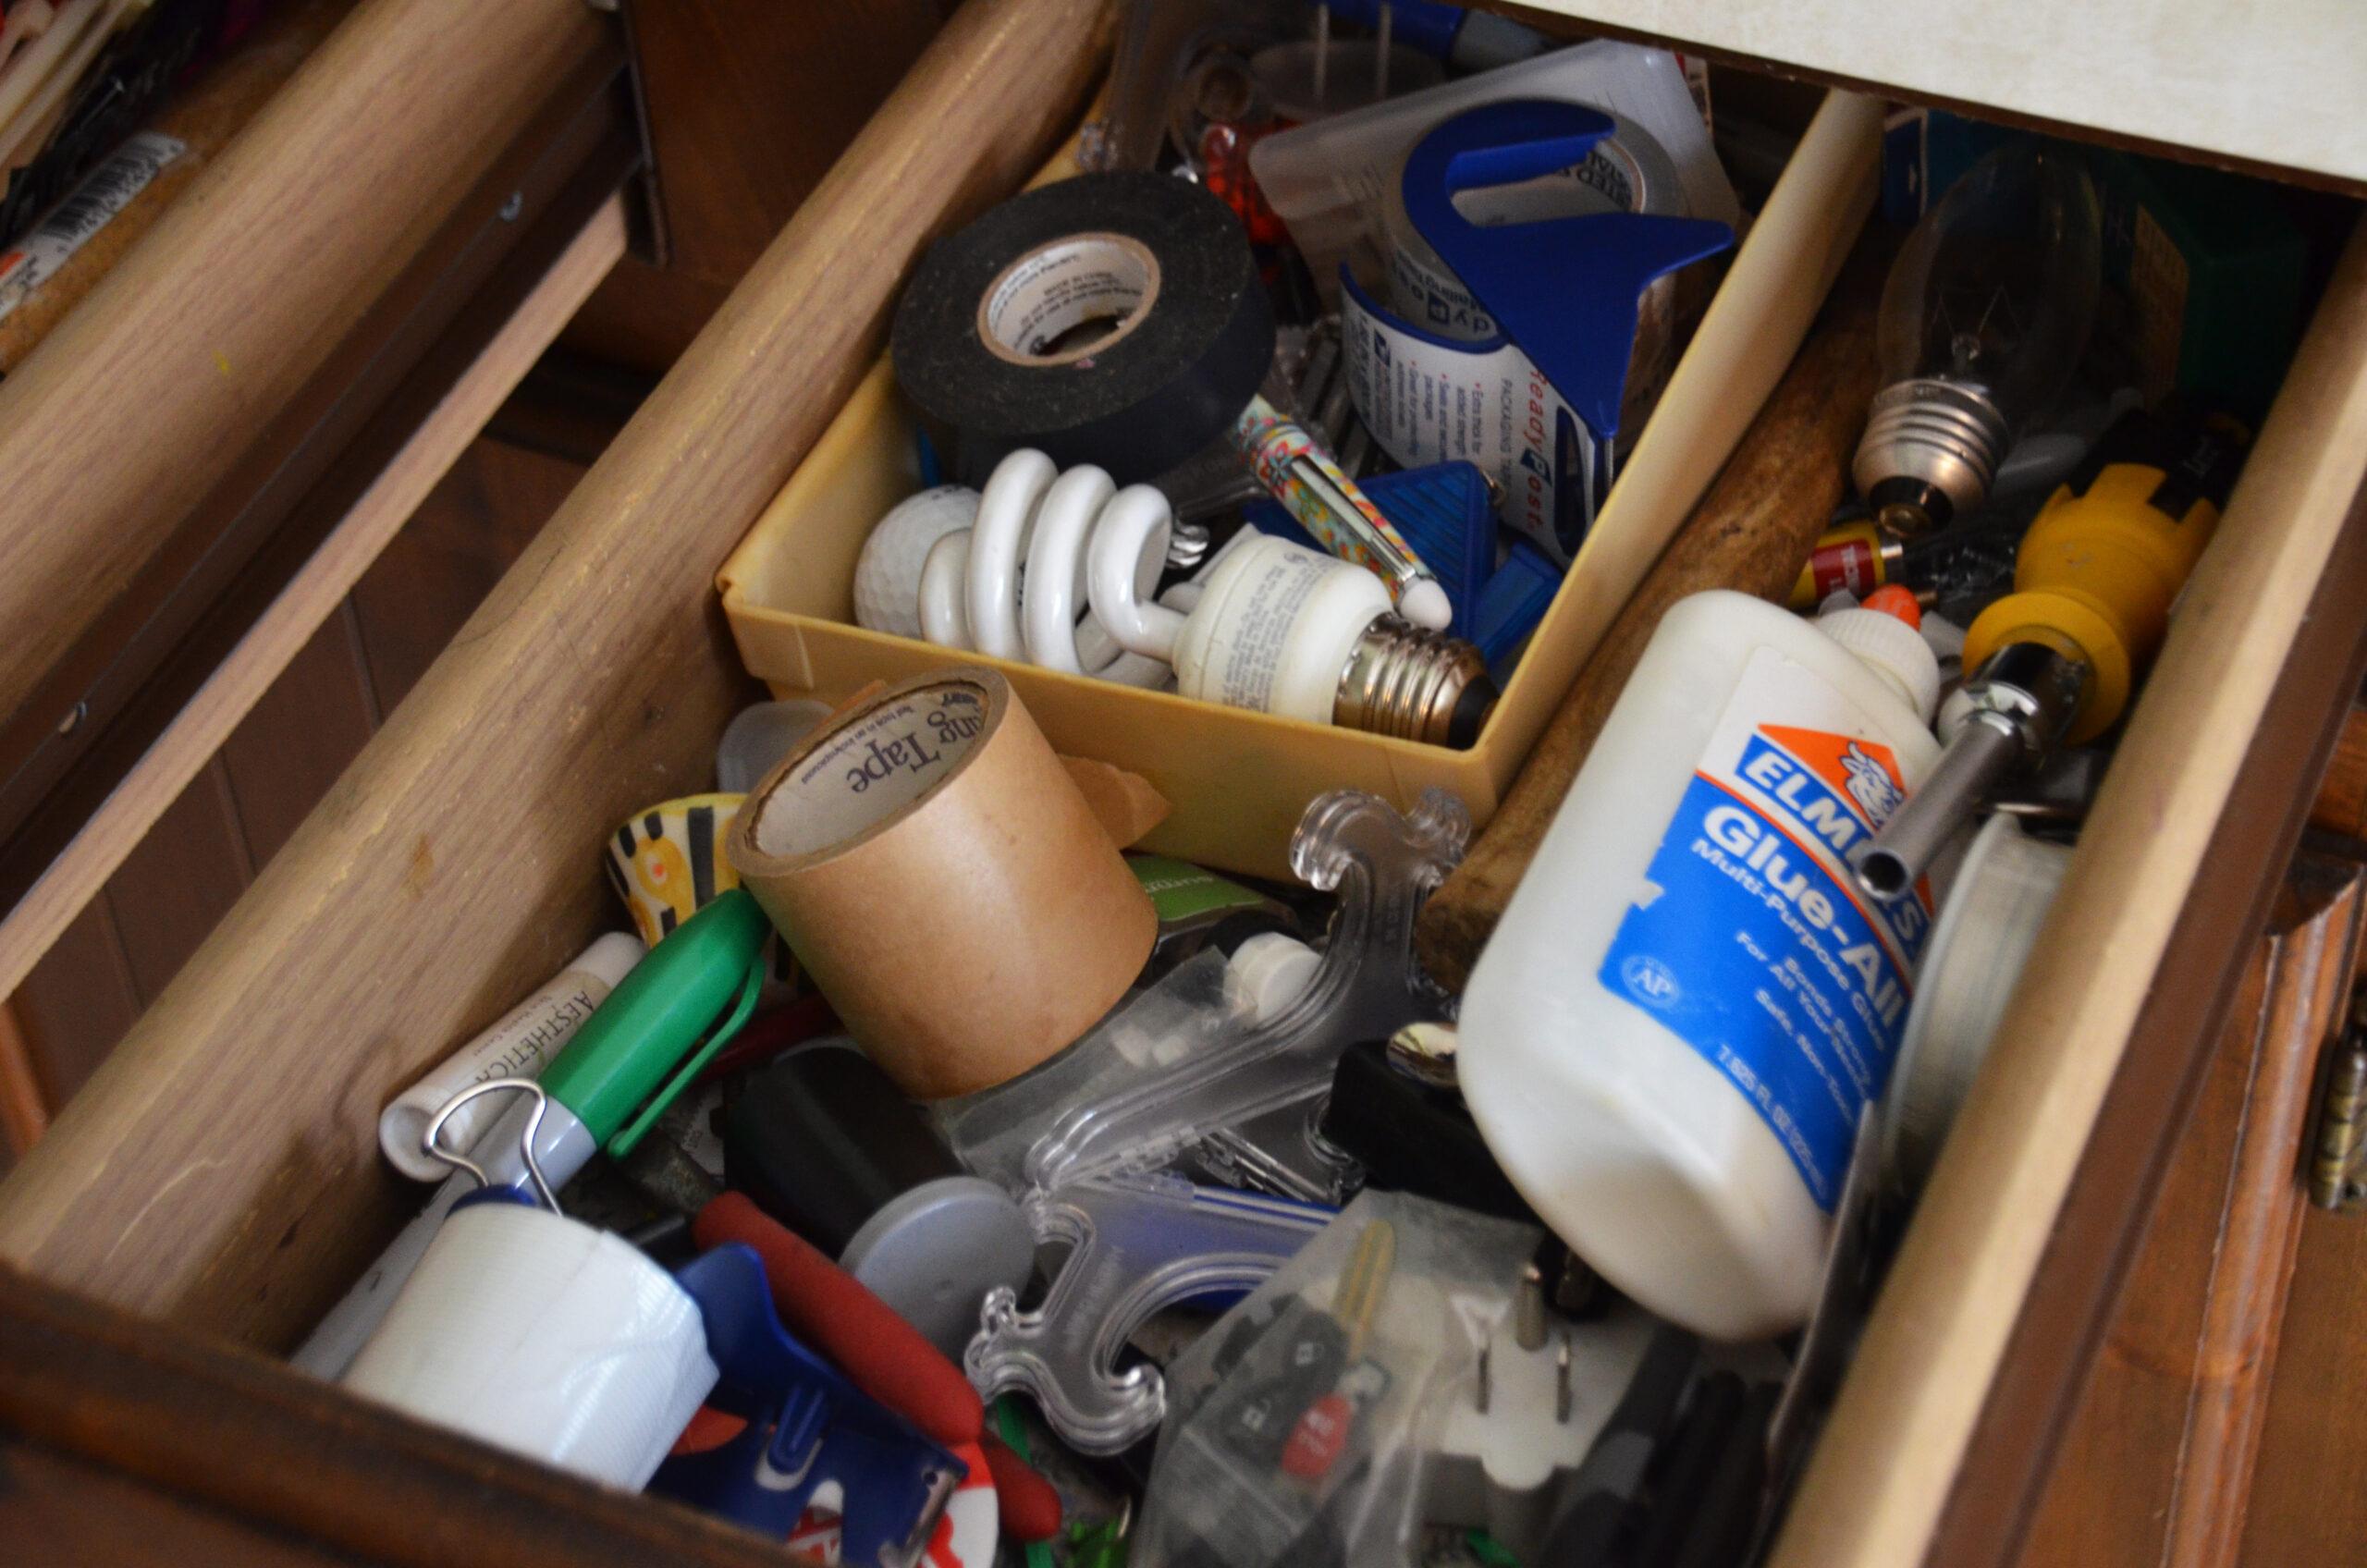 Inside a junk drawer